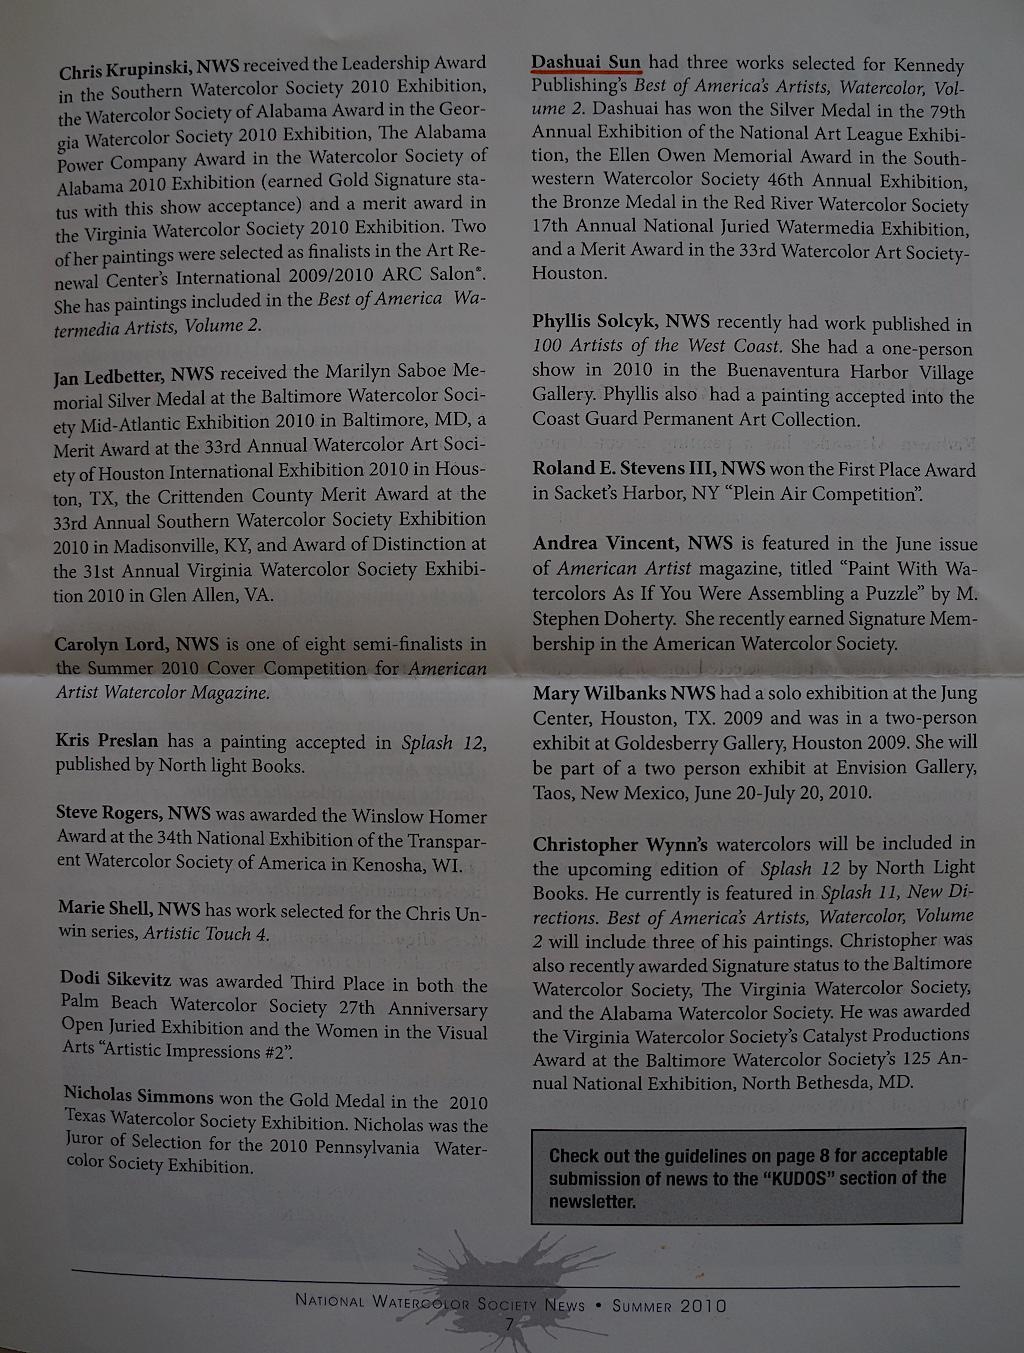 NWS News Summer 2010-02